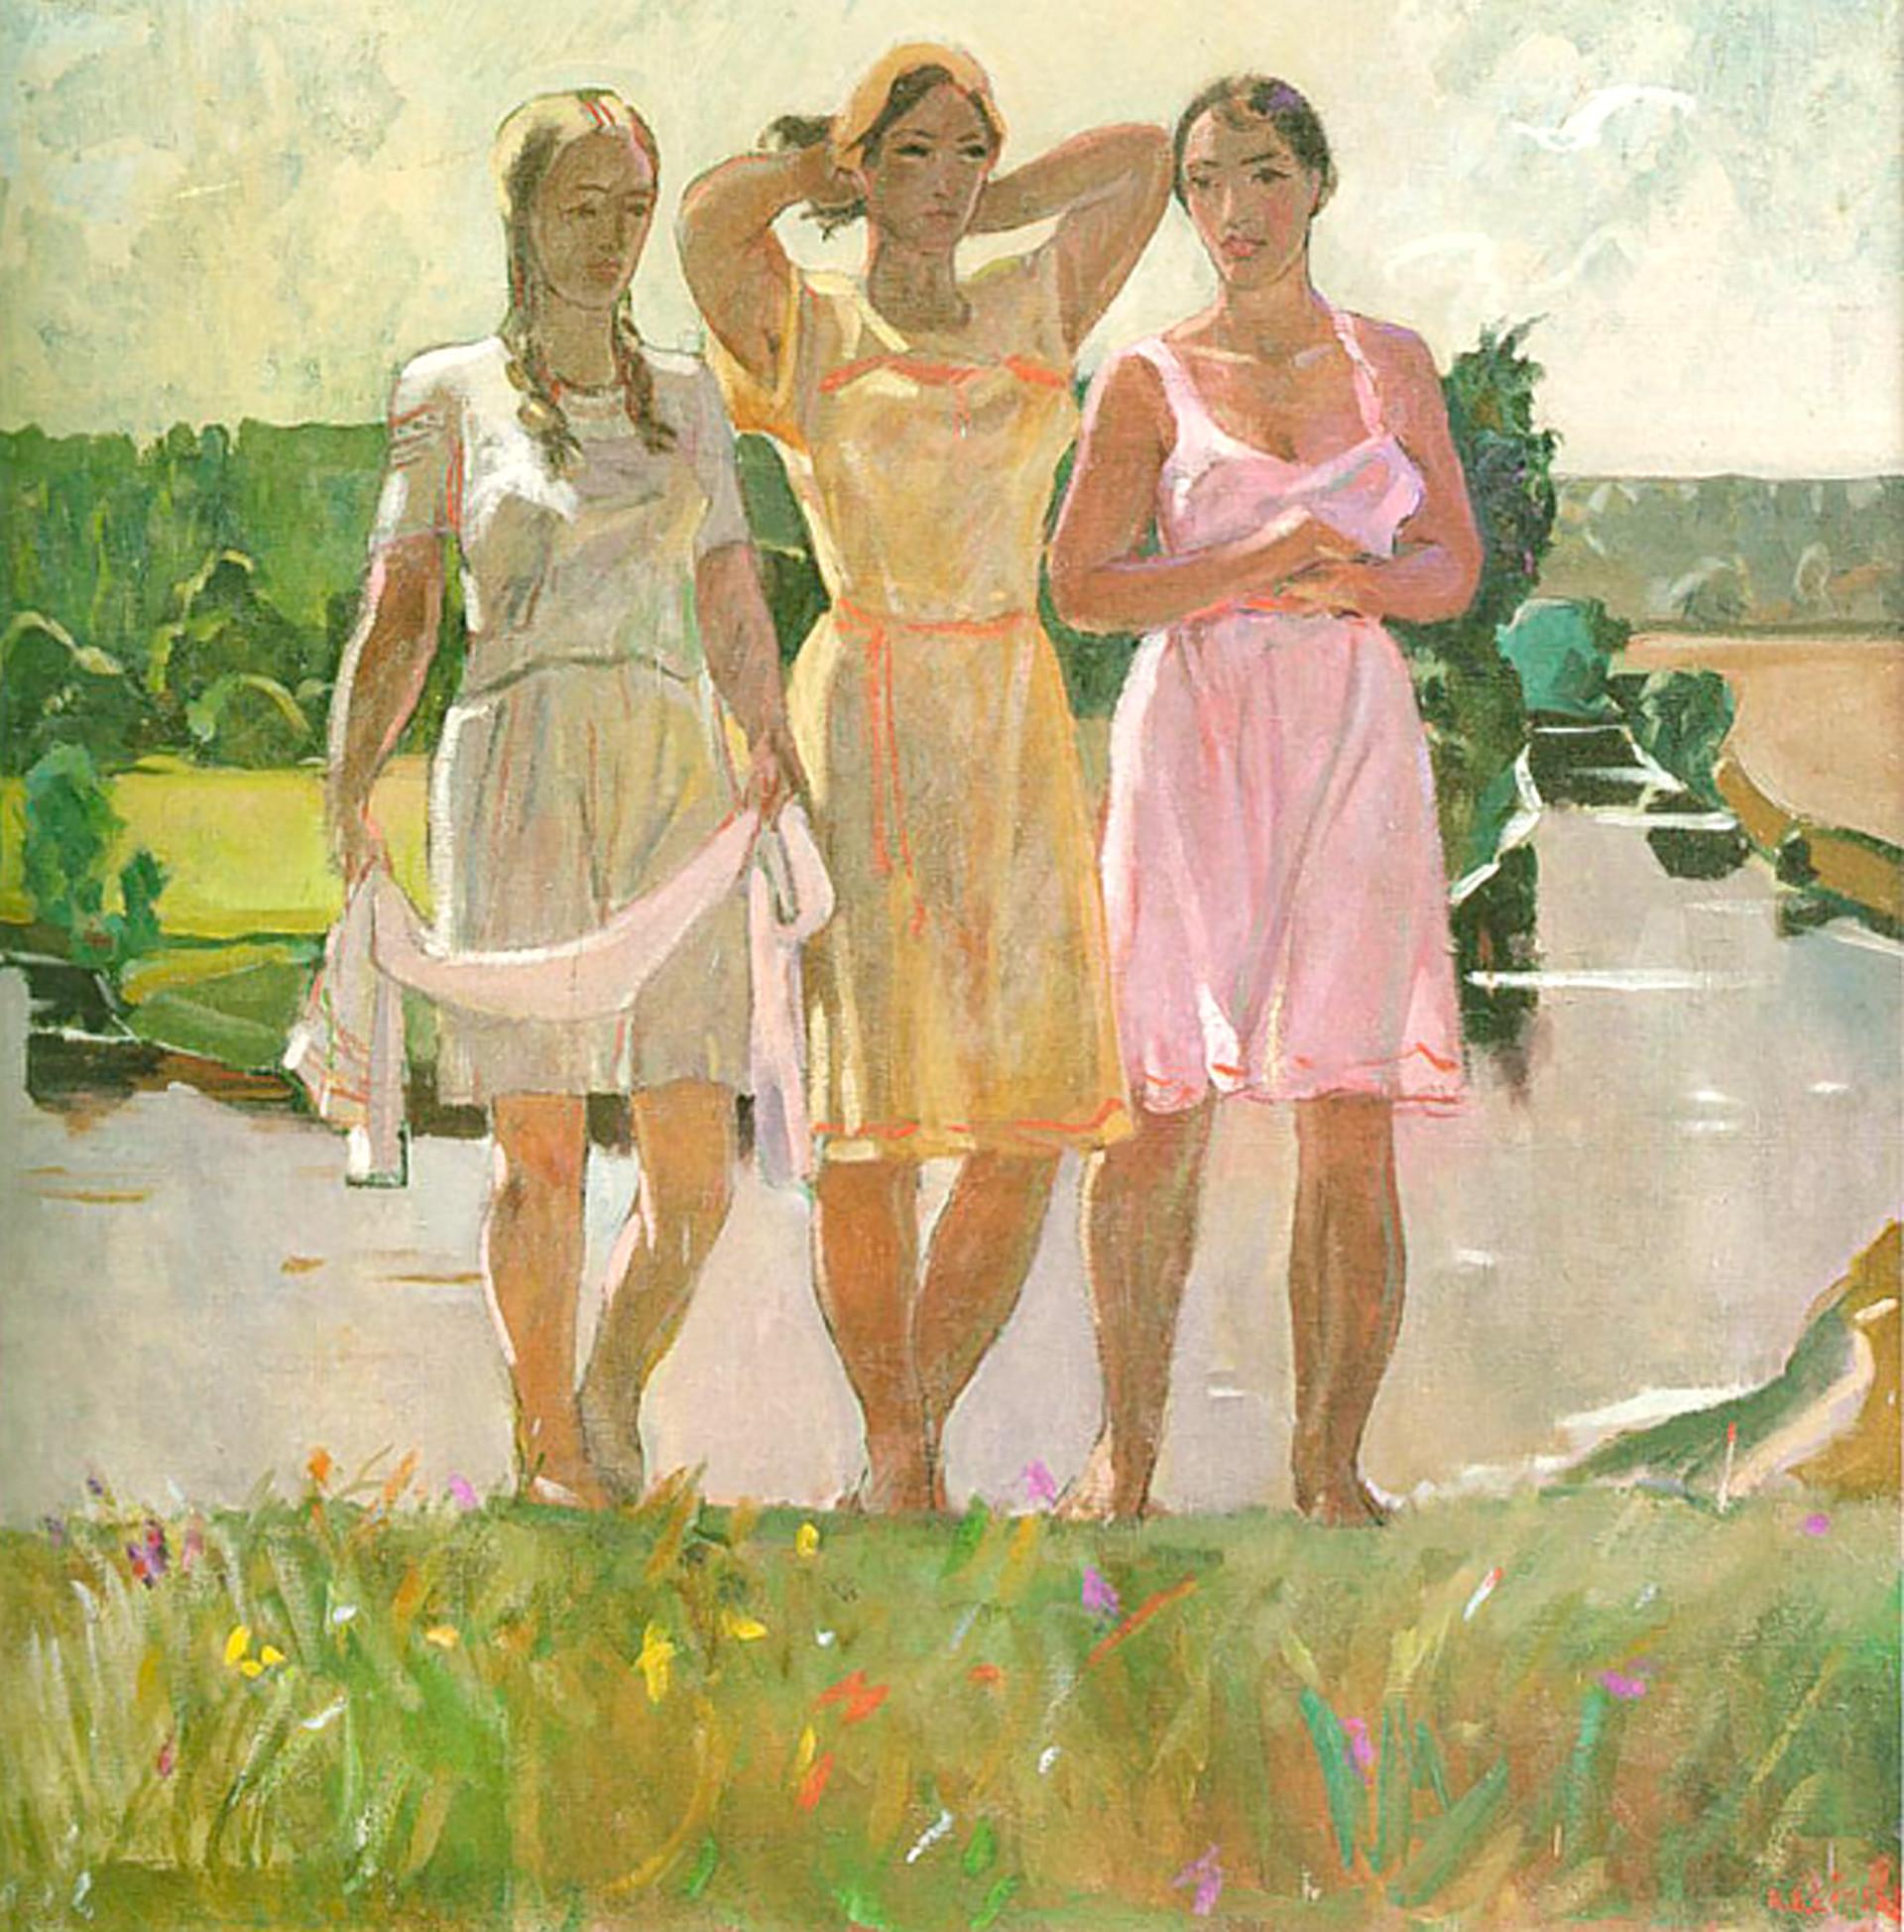 Oda pomladi, 1927, Aleksander Deineka